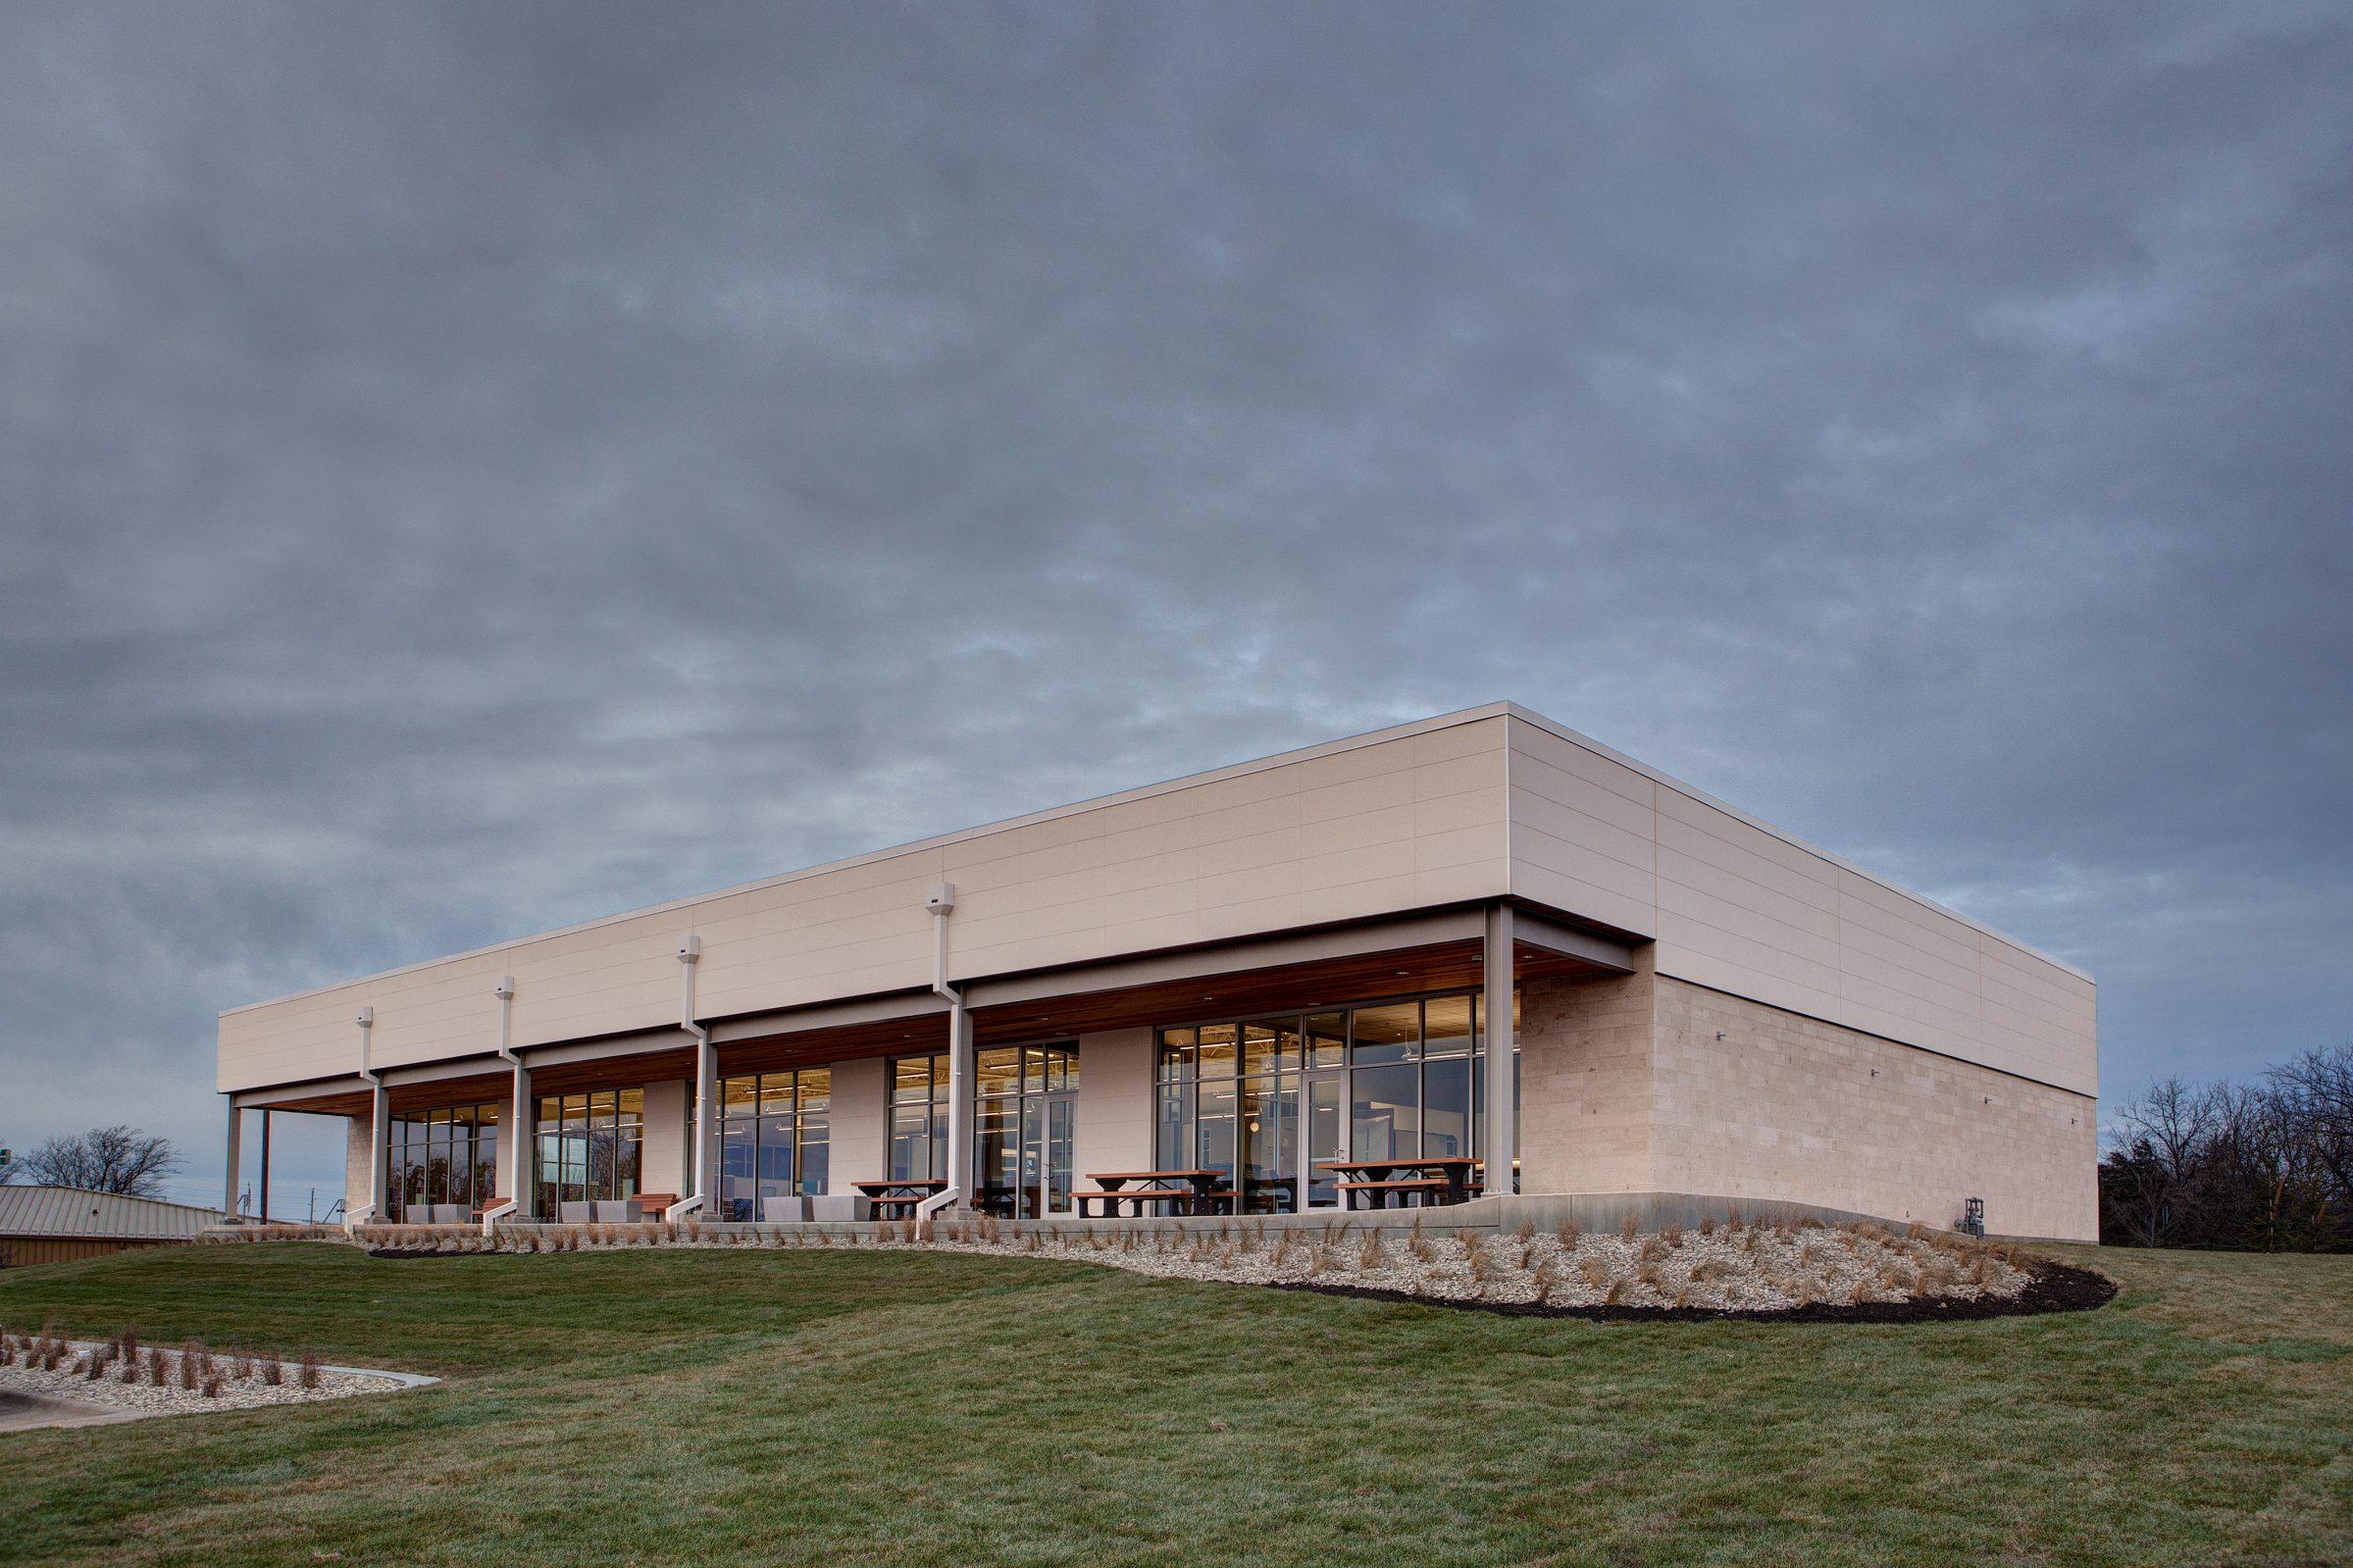 American Institute of Baking